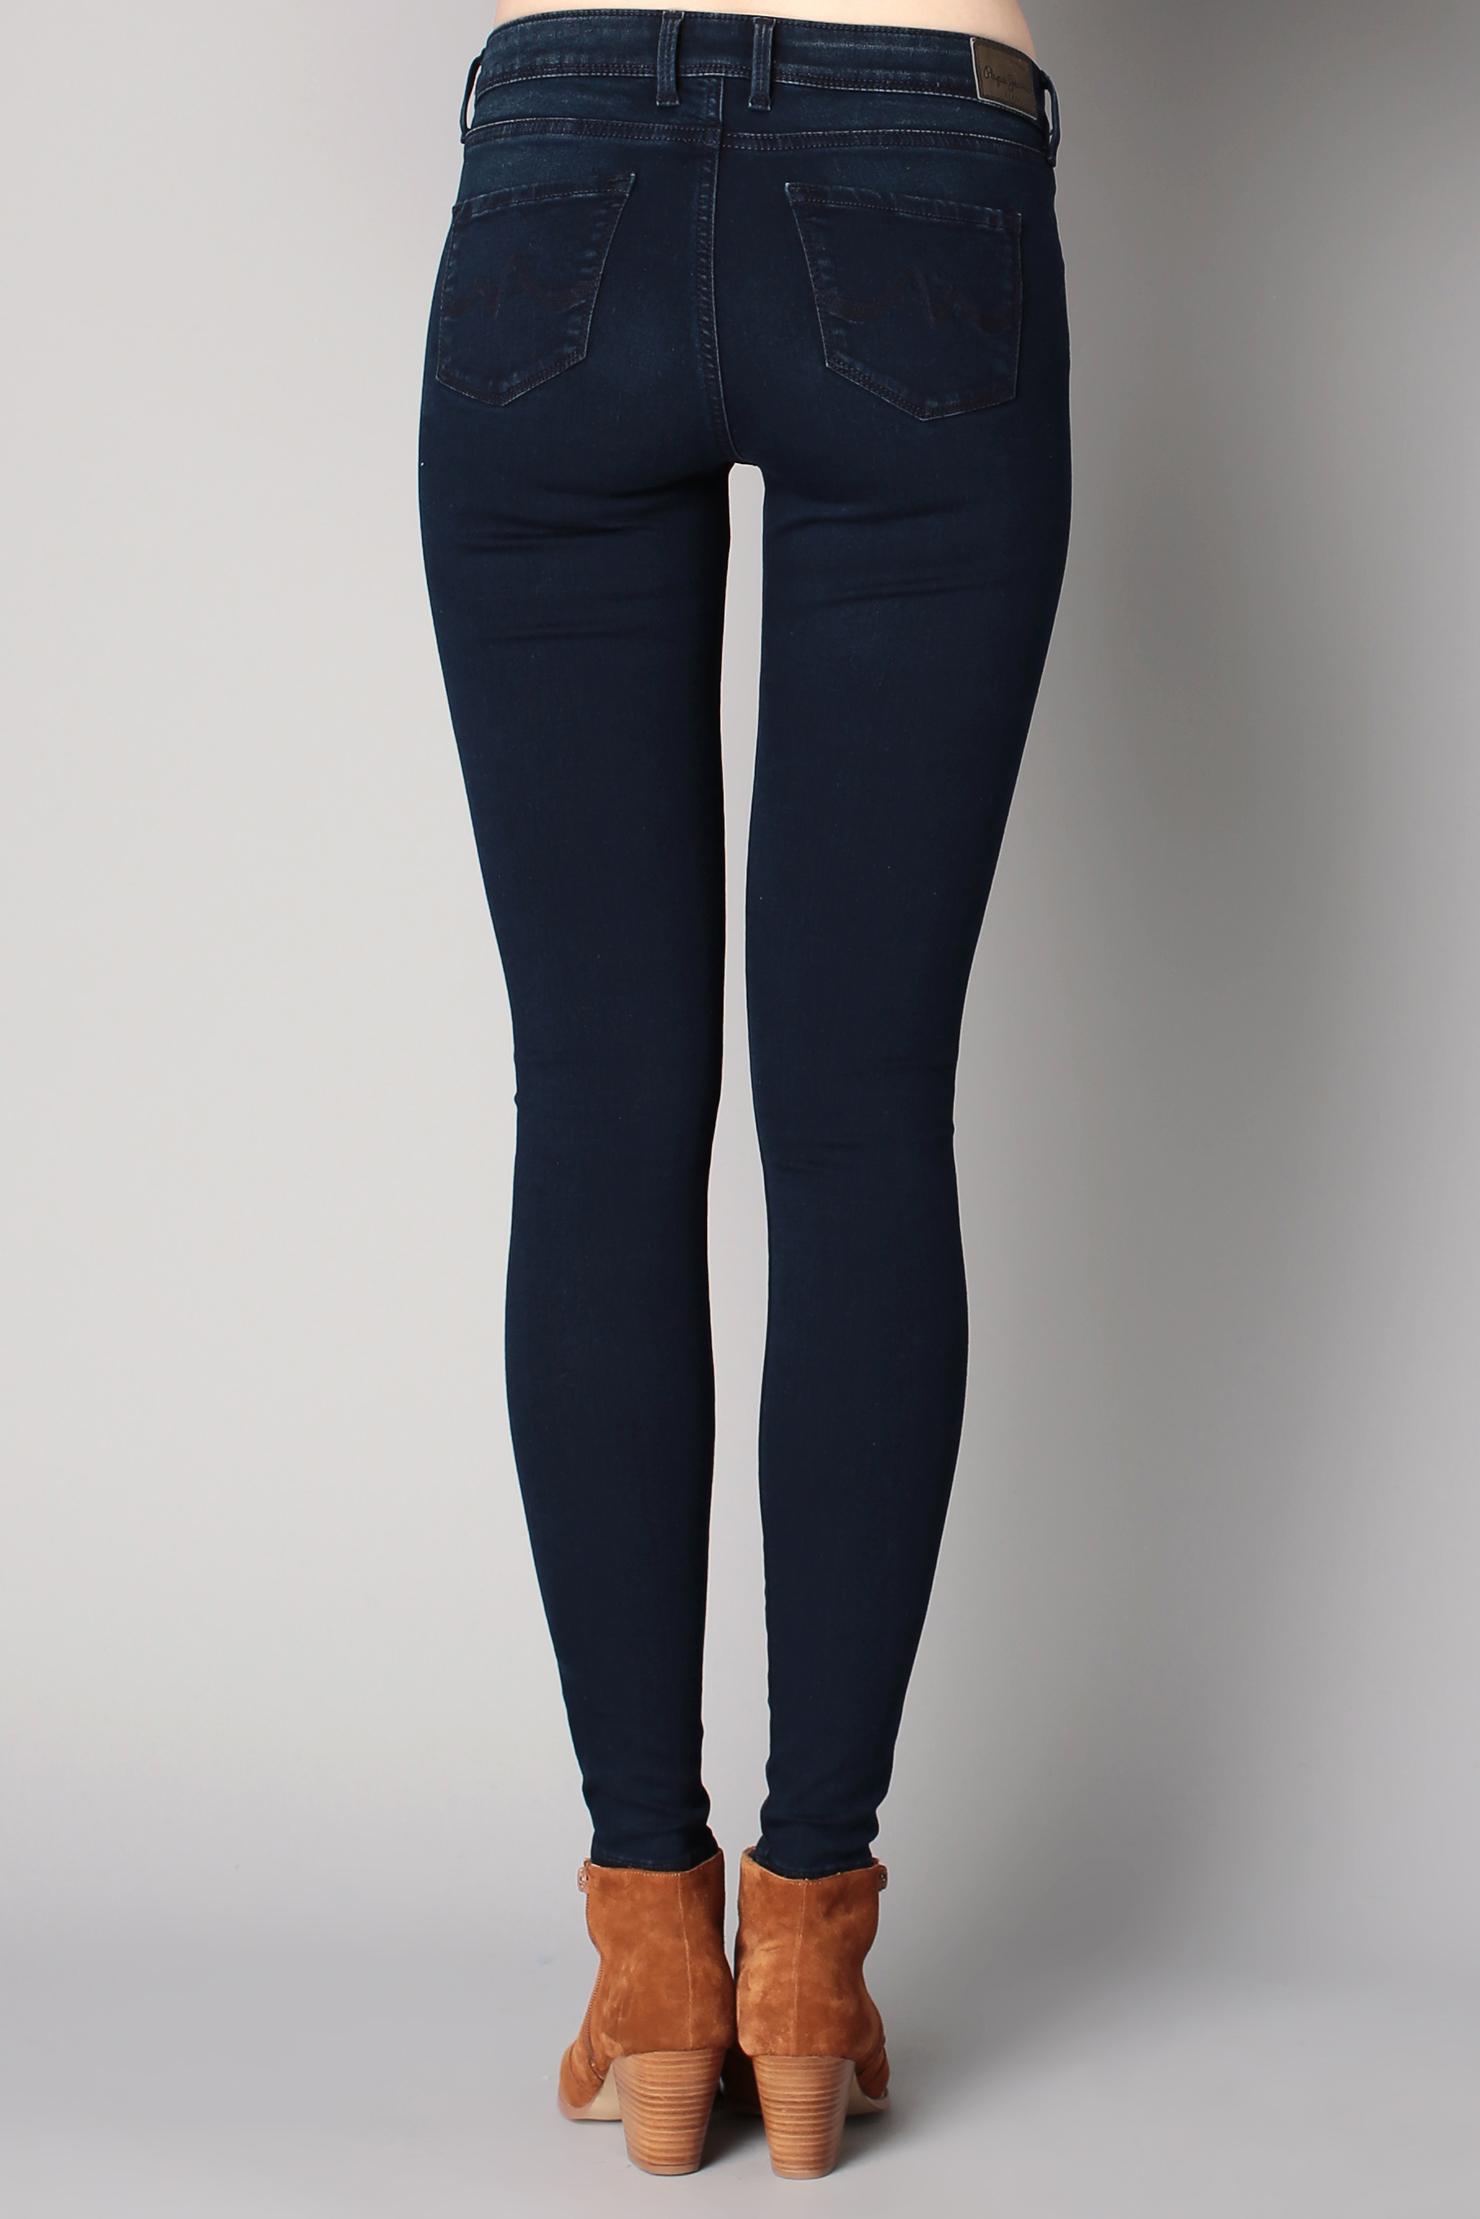 pepe jeans slim in blue lyst. Black Bedroom Furniture Sets. Home Design Ideas